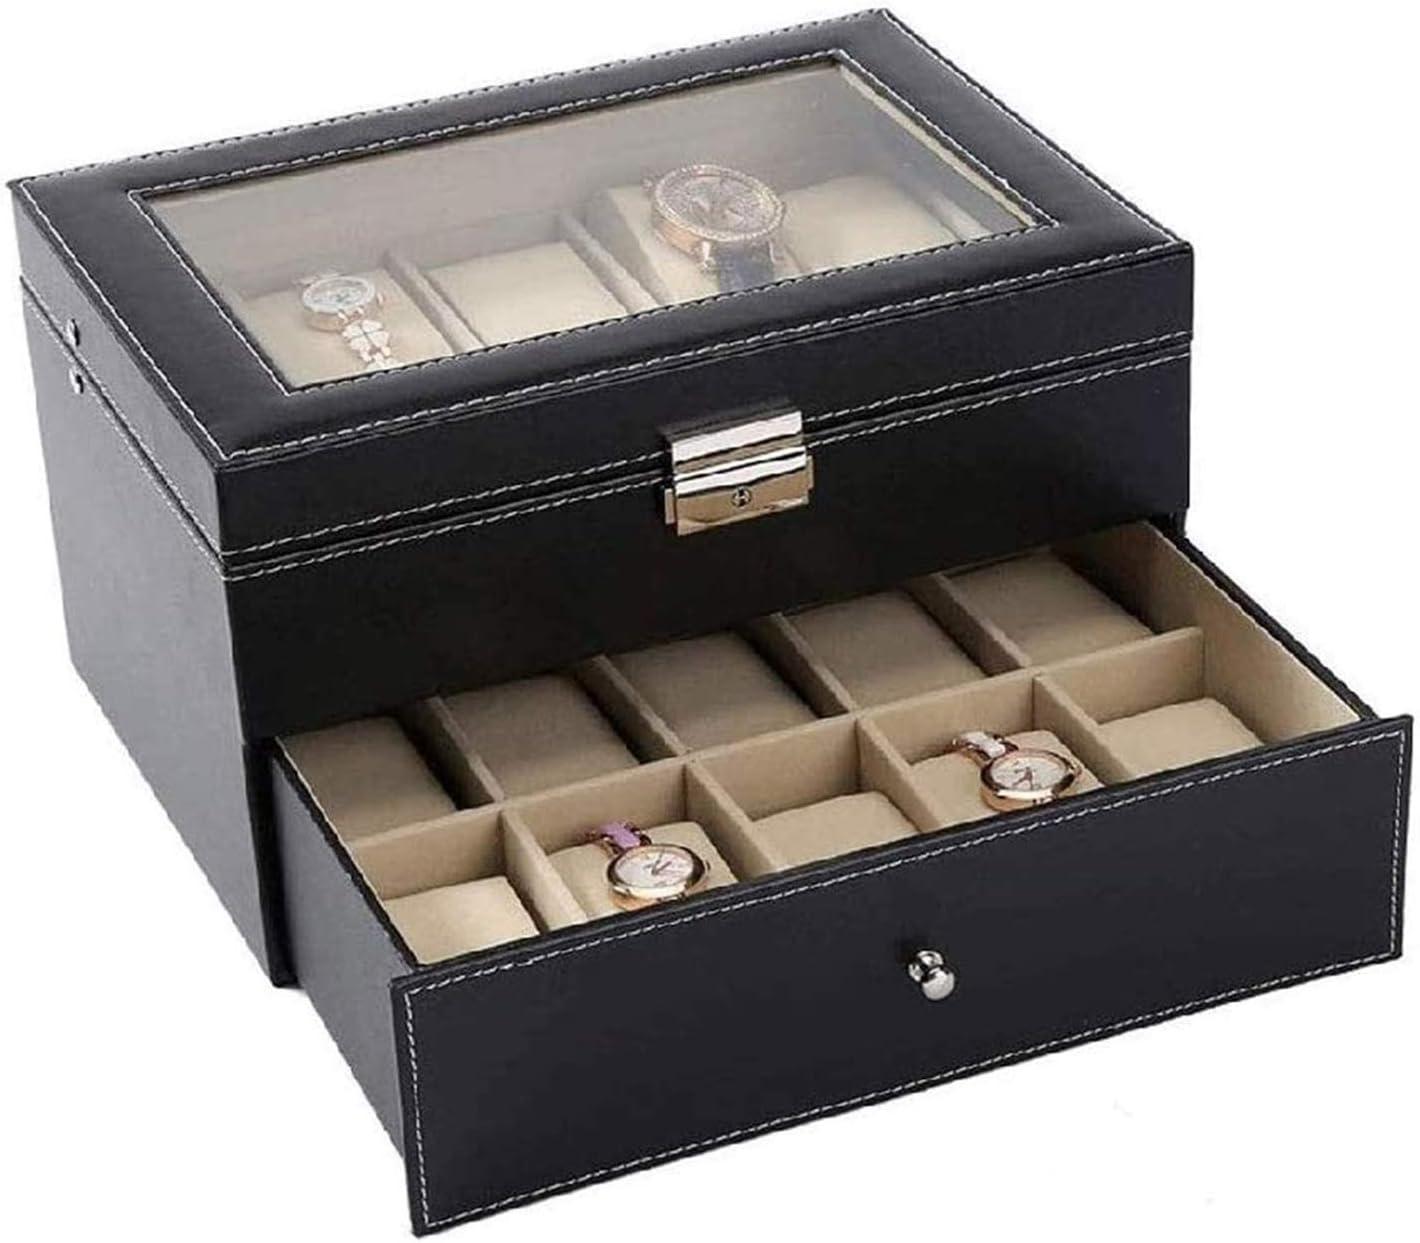 SSHA Free shipping New Jewlery Box Display Storage Case Hinge PU Latest item Black Metal Leath